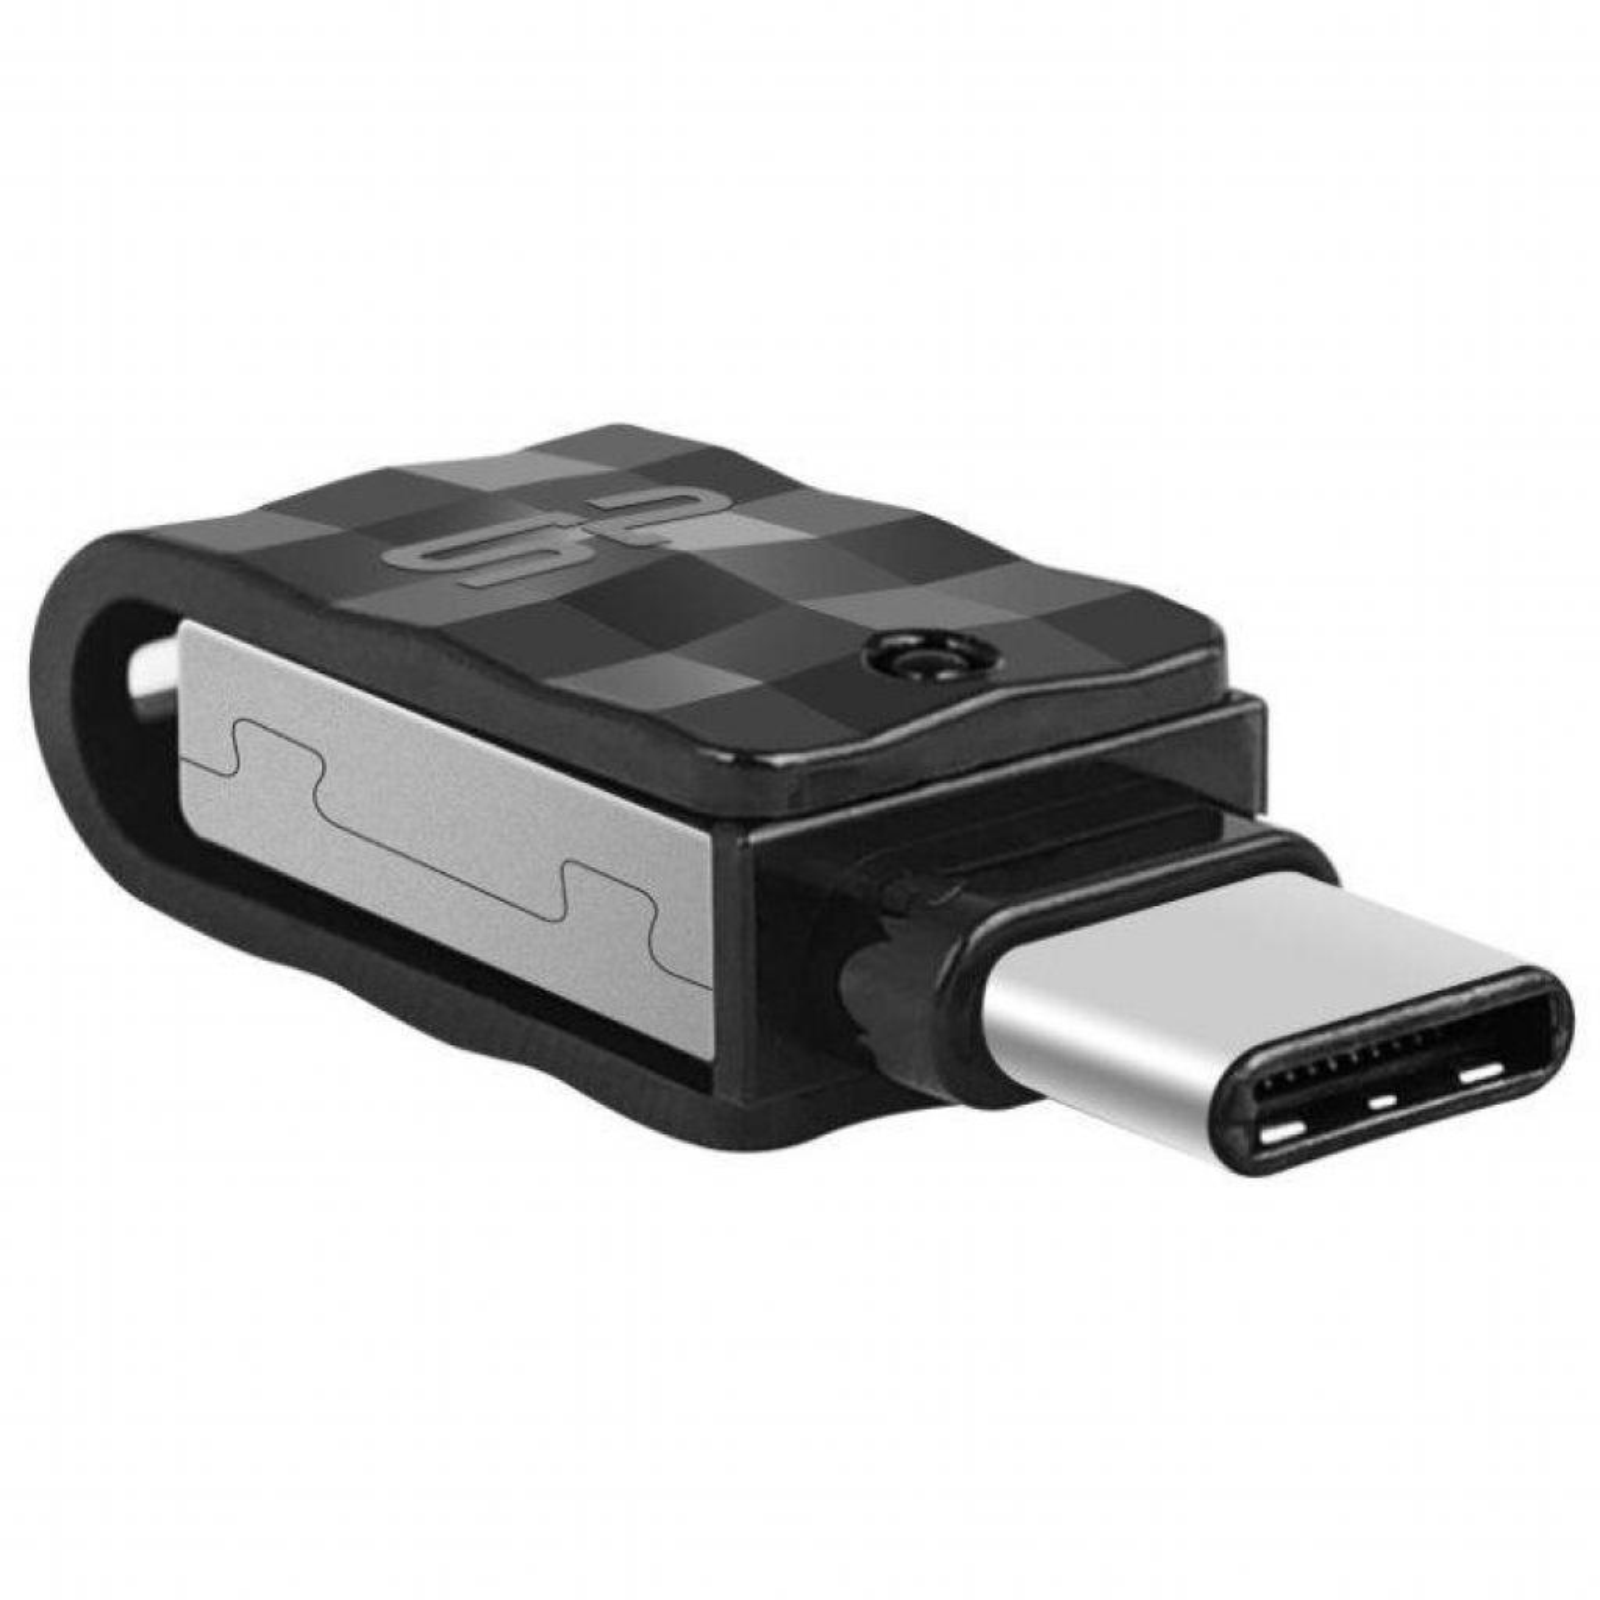 USB флеш накопитель Silicon Power 64GB Mobile C31 USB 3.1 / USB Type-C (SP064GBUC3C31V1K) изображение 3